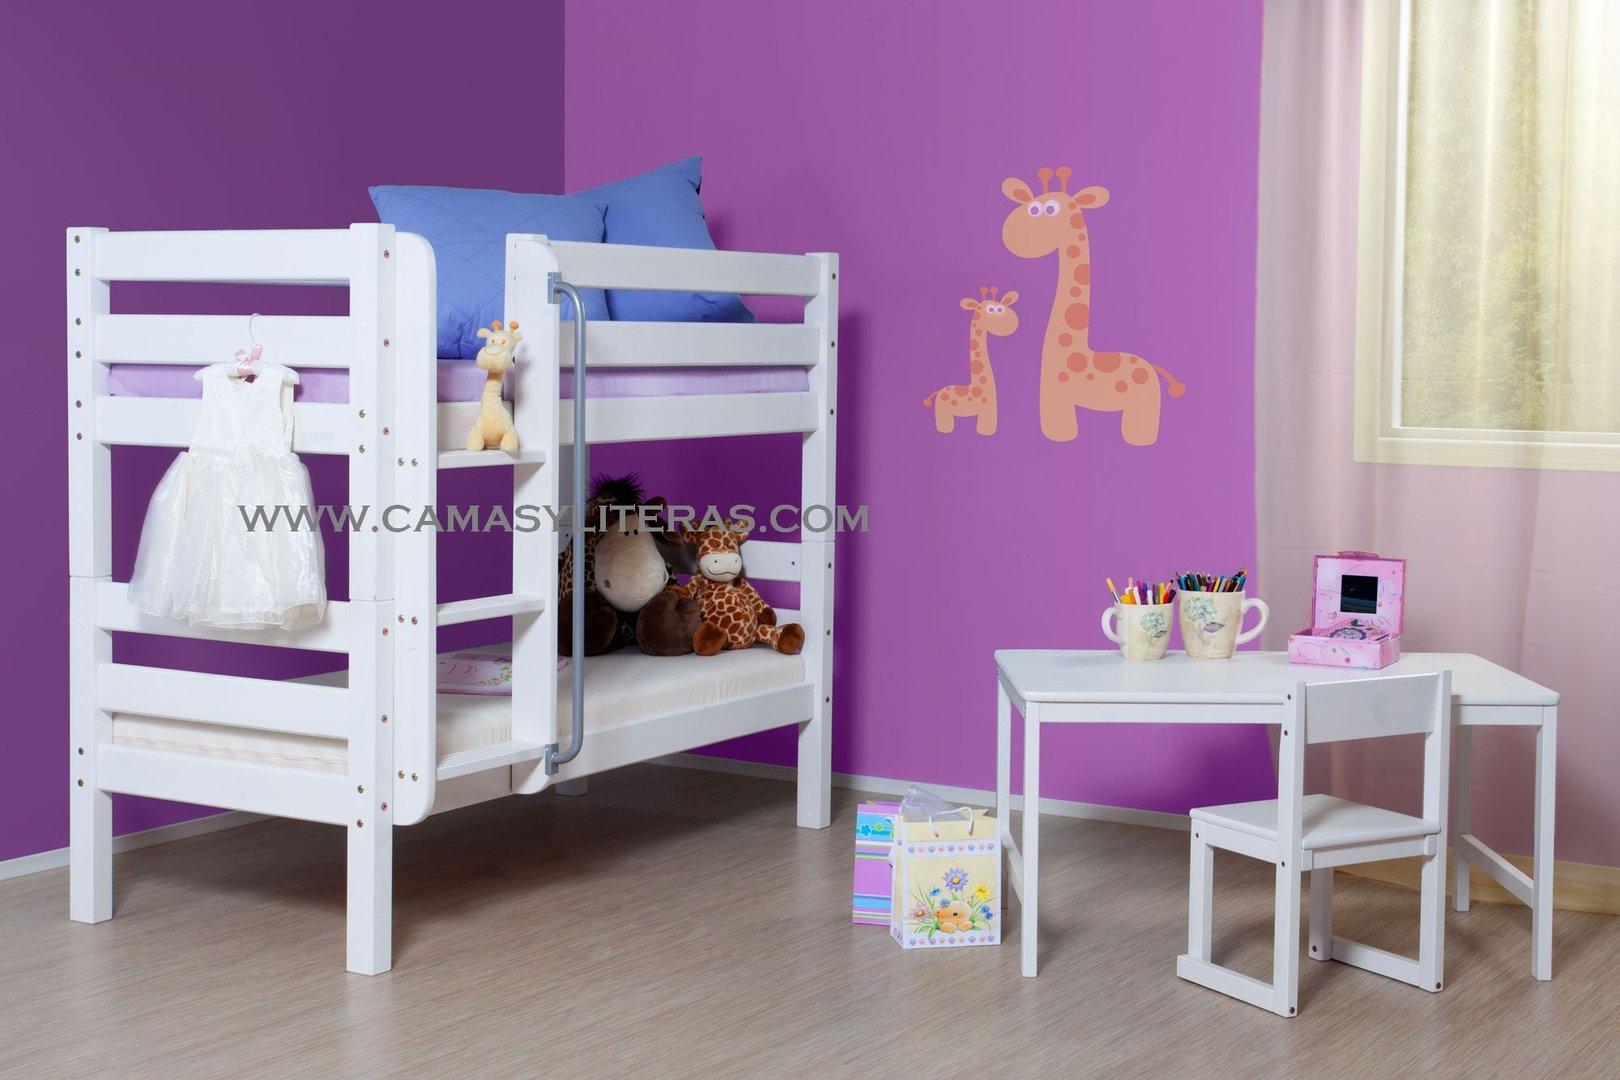 Litera sasha 70 x 160 camas y literas - Literas para bebes ...